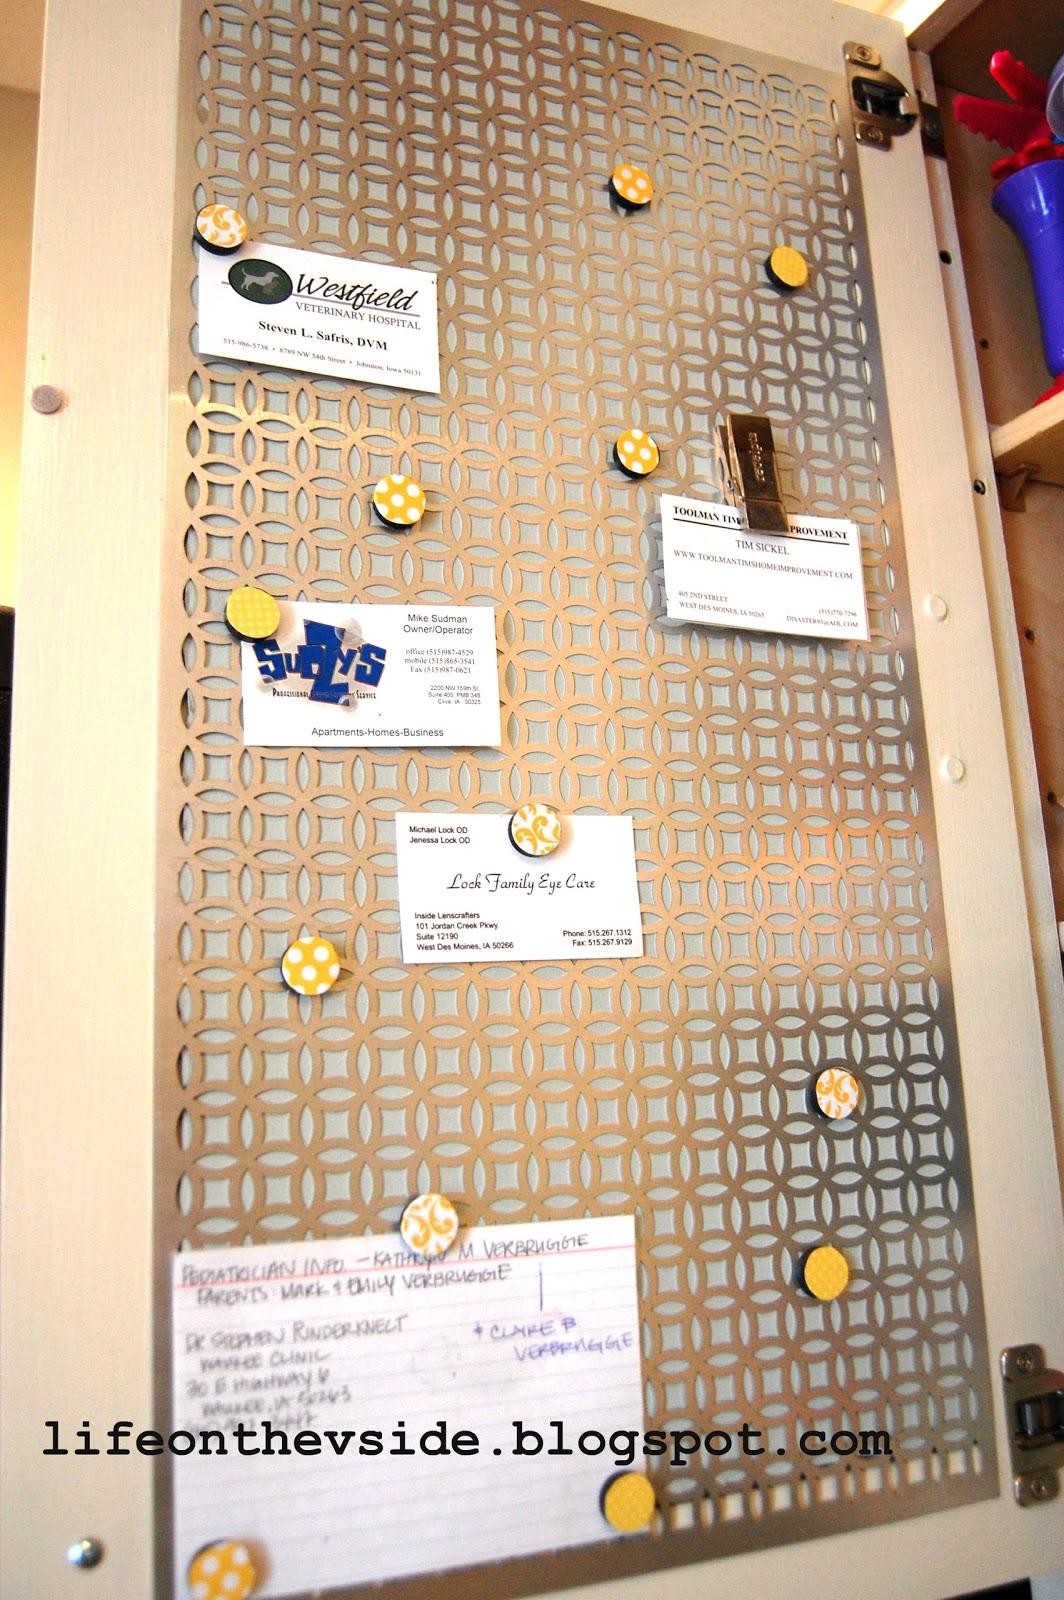 Outstanding On The V Side Kitchen Cabinet Magnet Board Tutorial Download Free Architecture Designs Estepponolmadebymaigaardcom